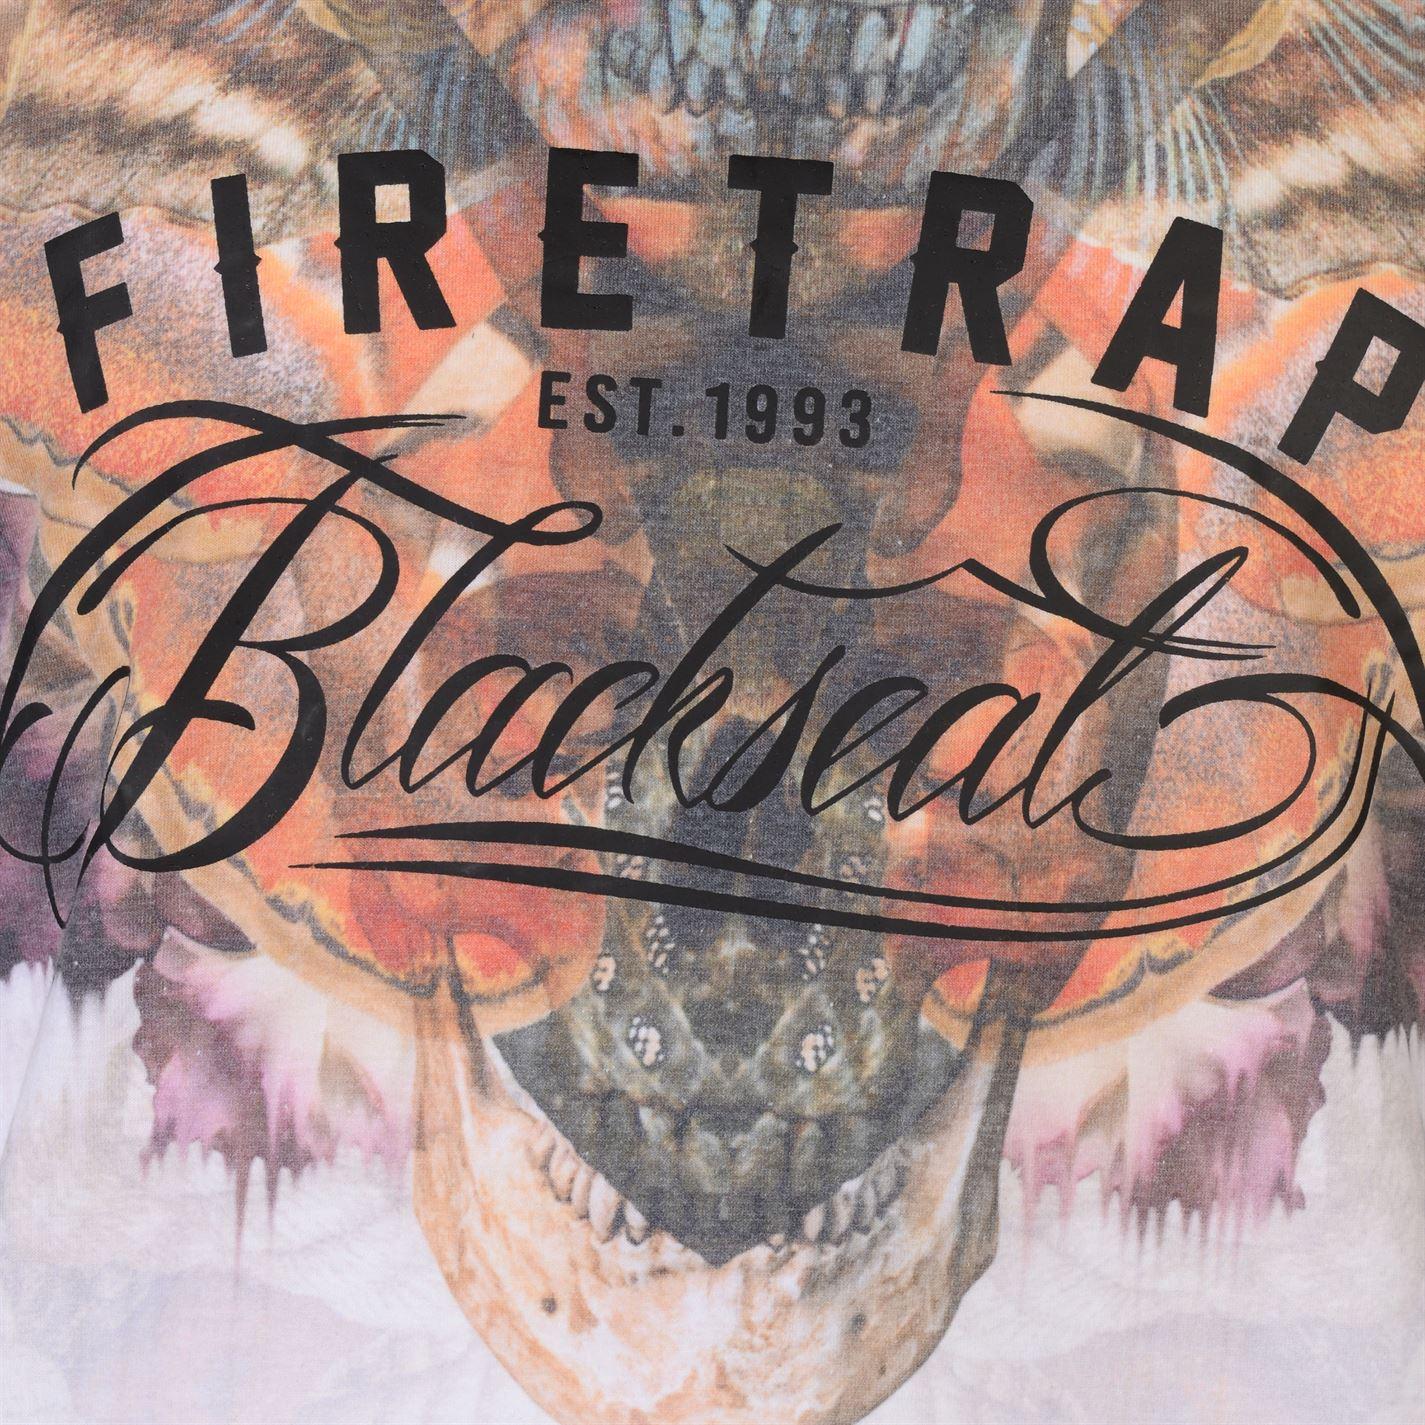 Firetrap Moth Gilet Homme Gents Muscle Tank Top